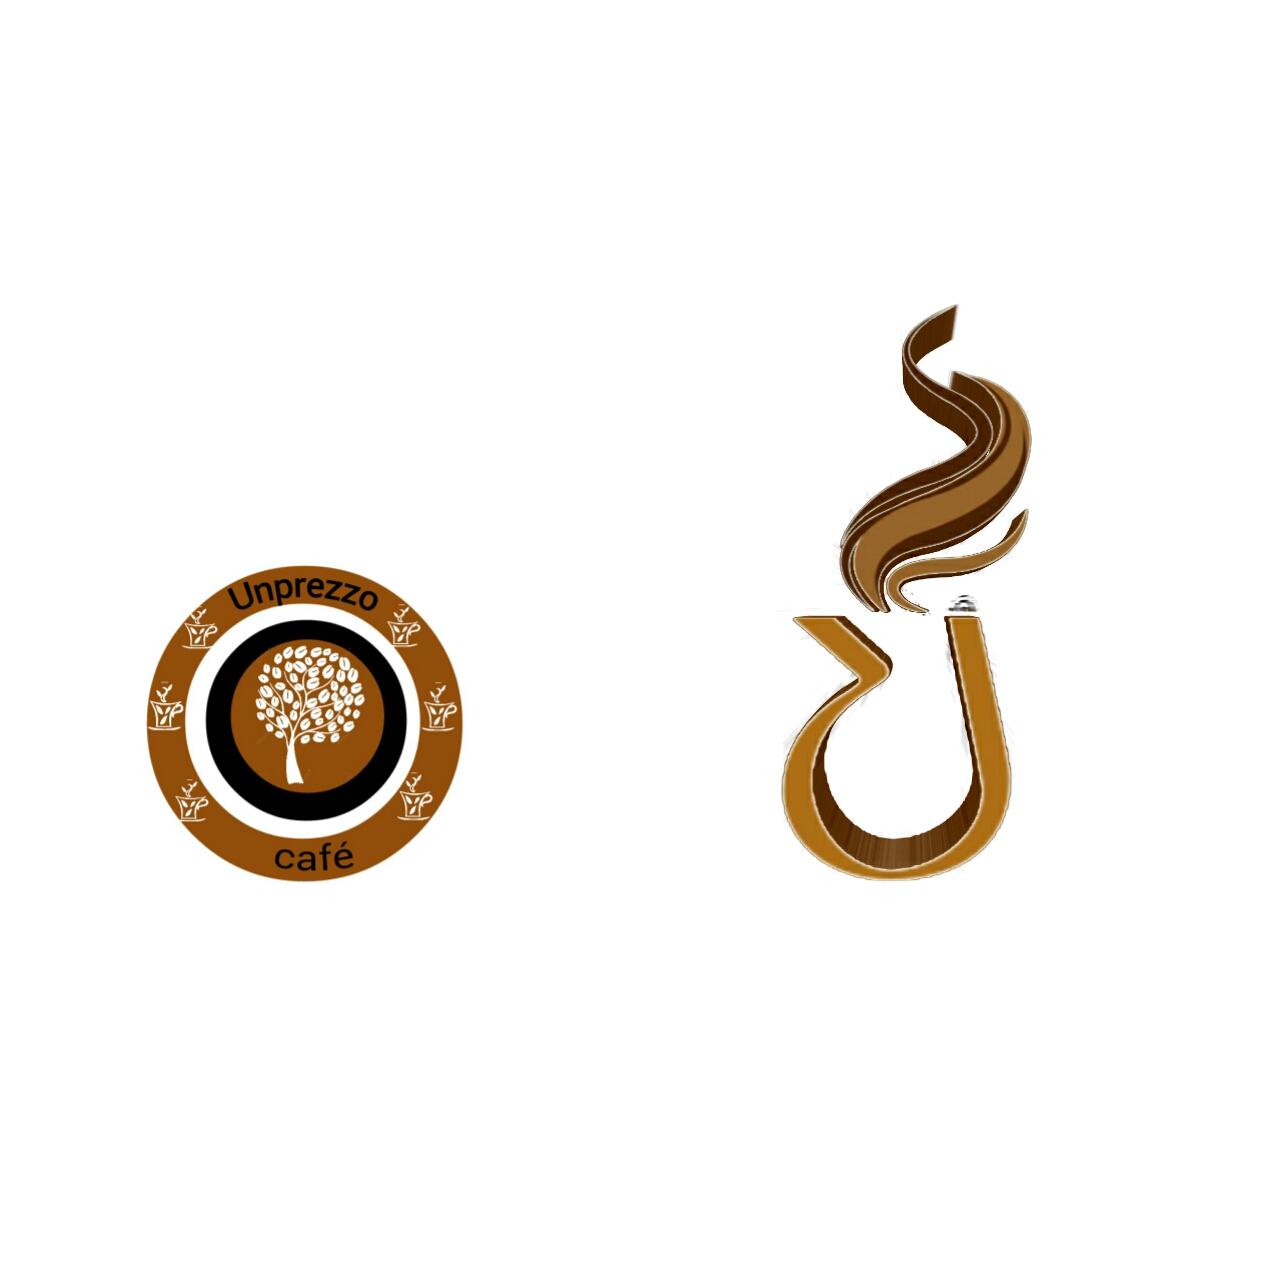 Название, цвета, логотип и дизайн оформления для сети кофеен фото f_0765b9aee148611d.jpg